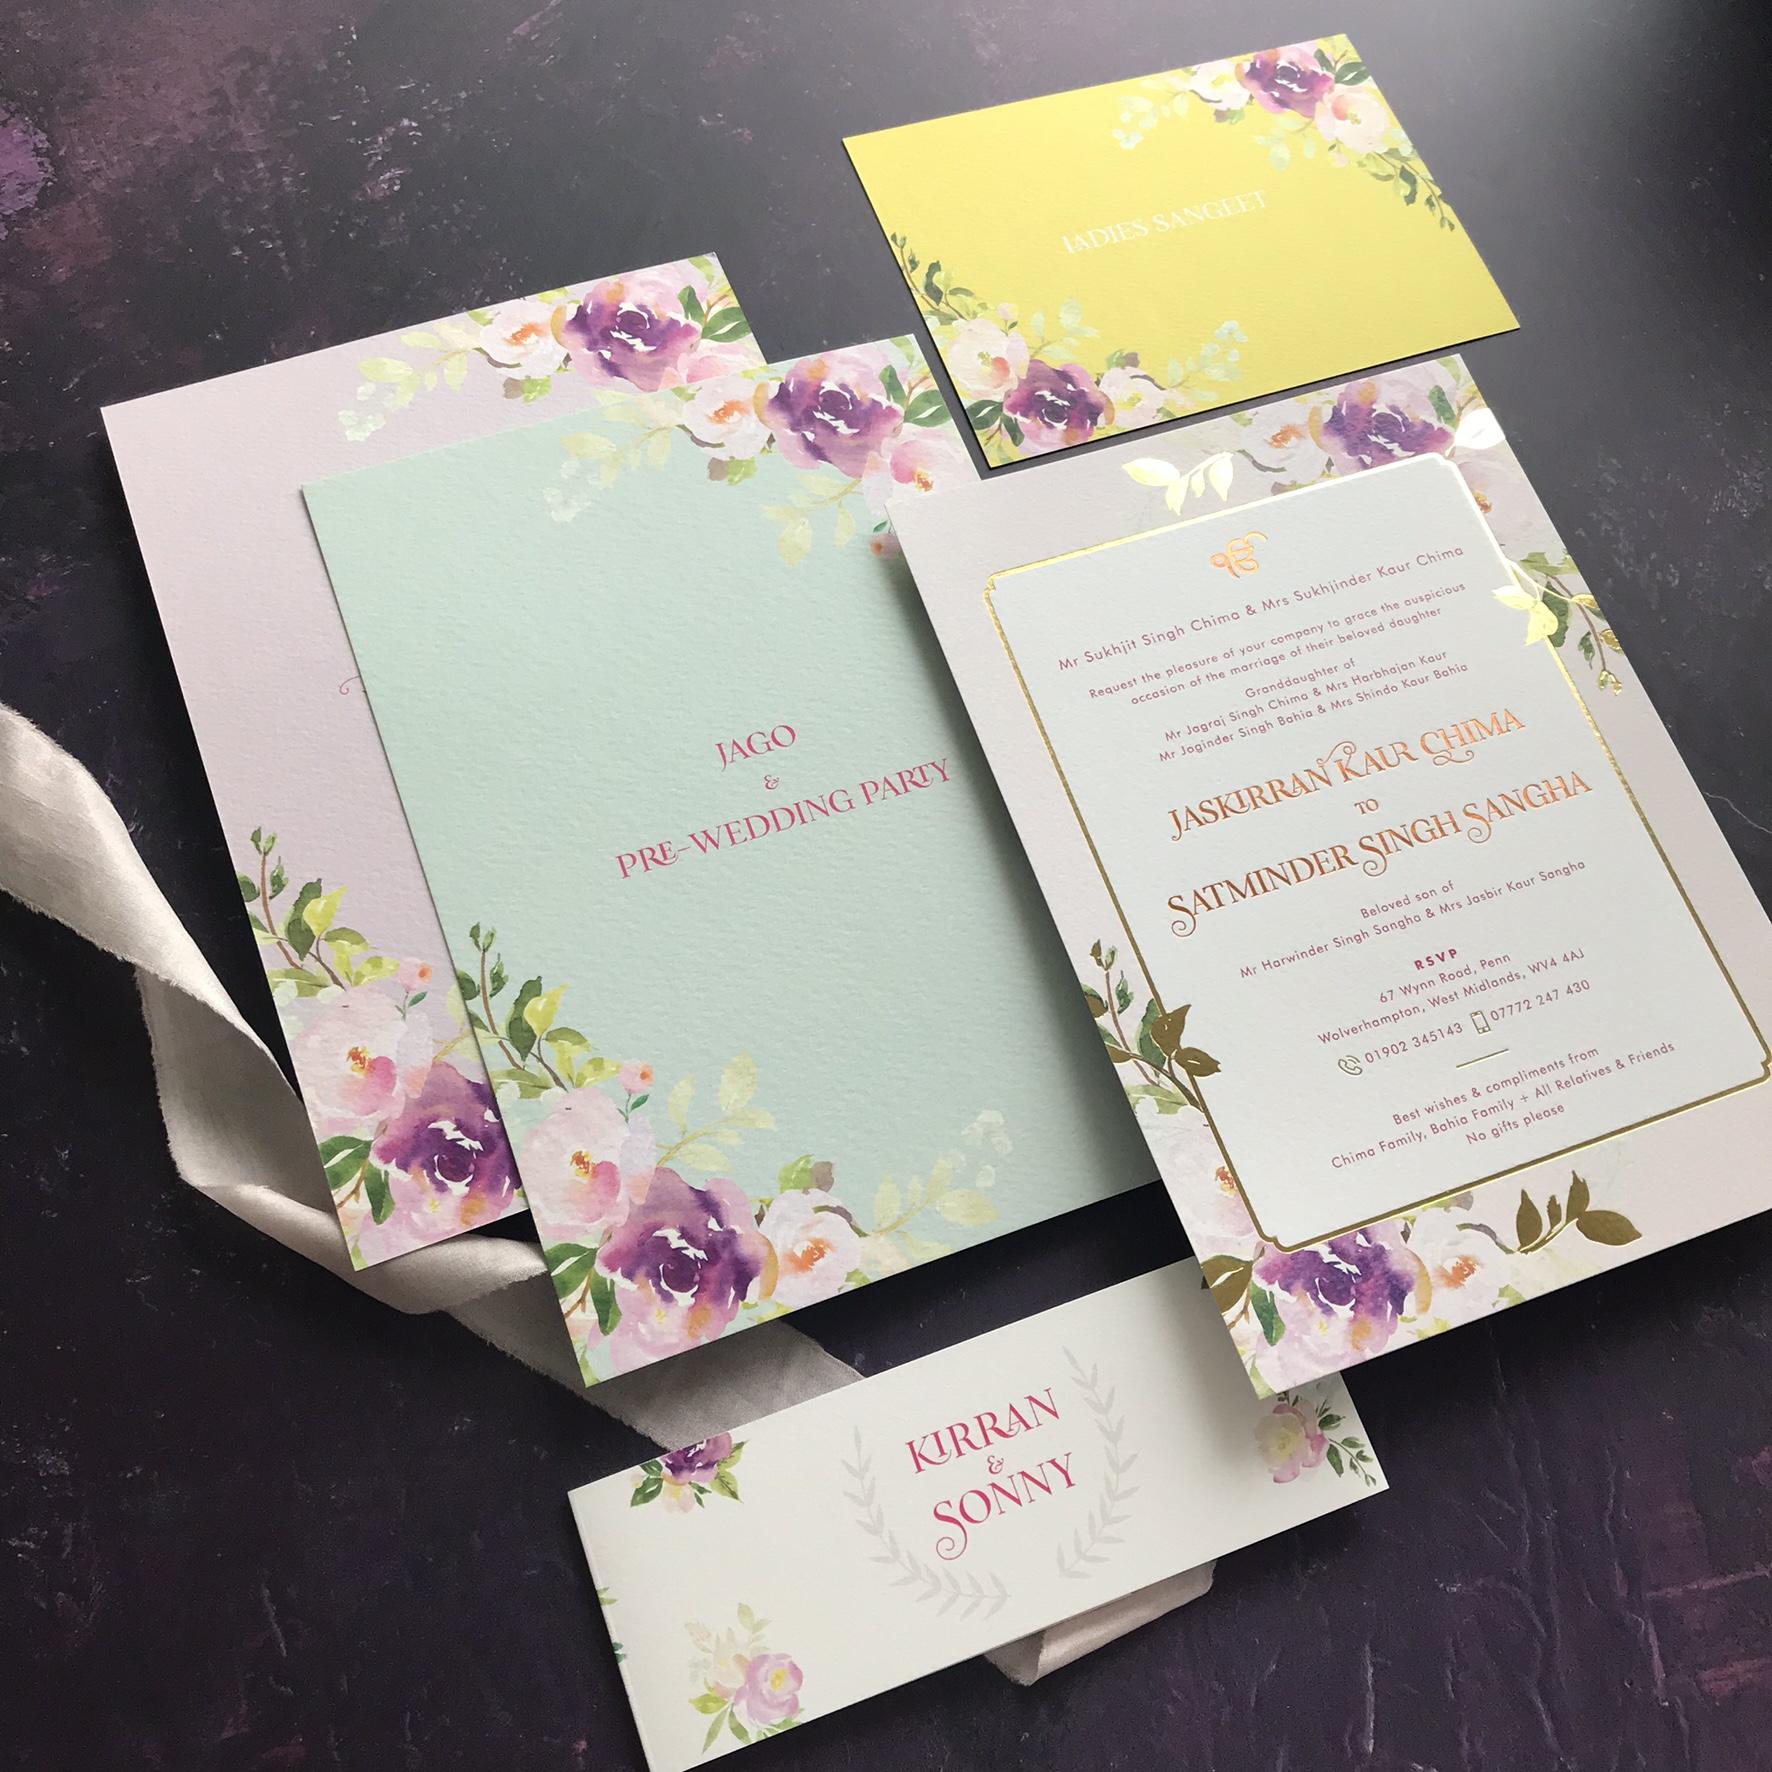 bespoke - Best Asian Wedding Stationery Supplier in UK